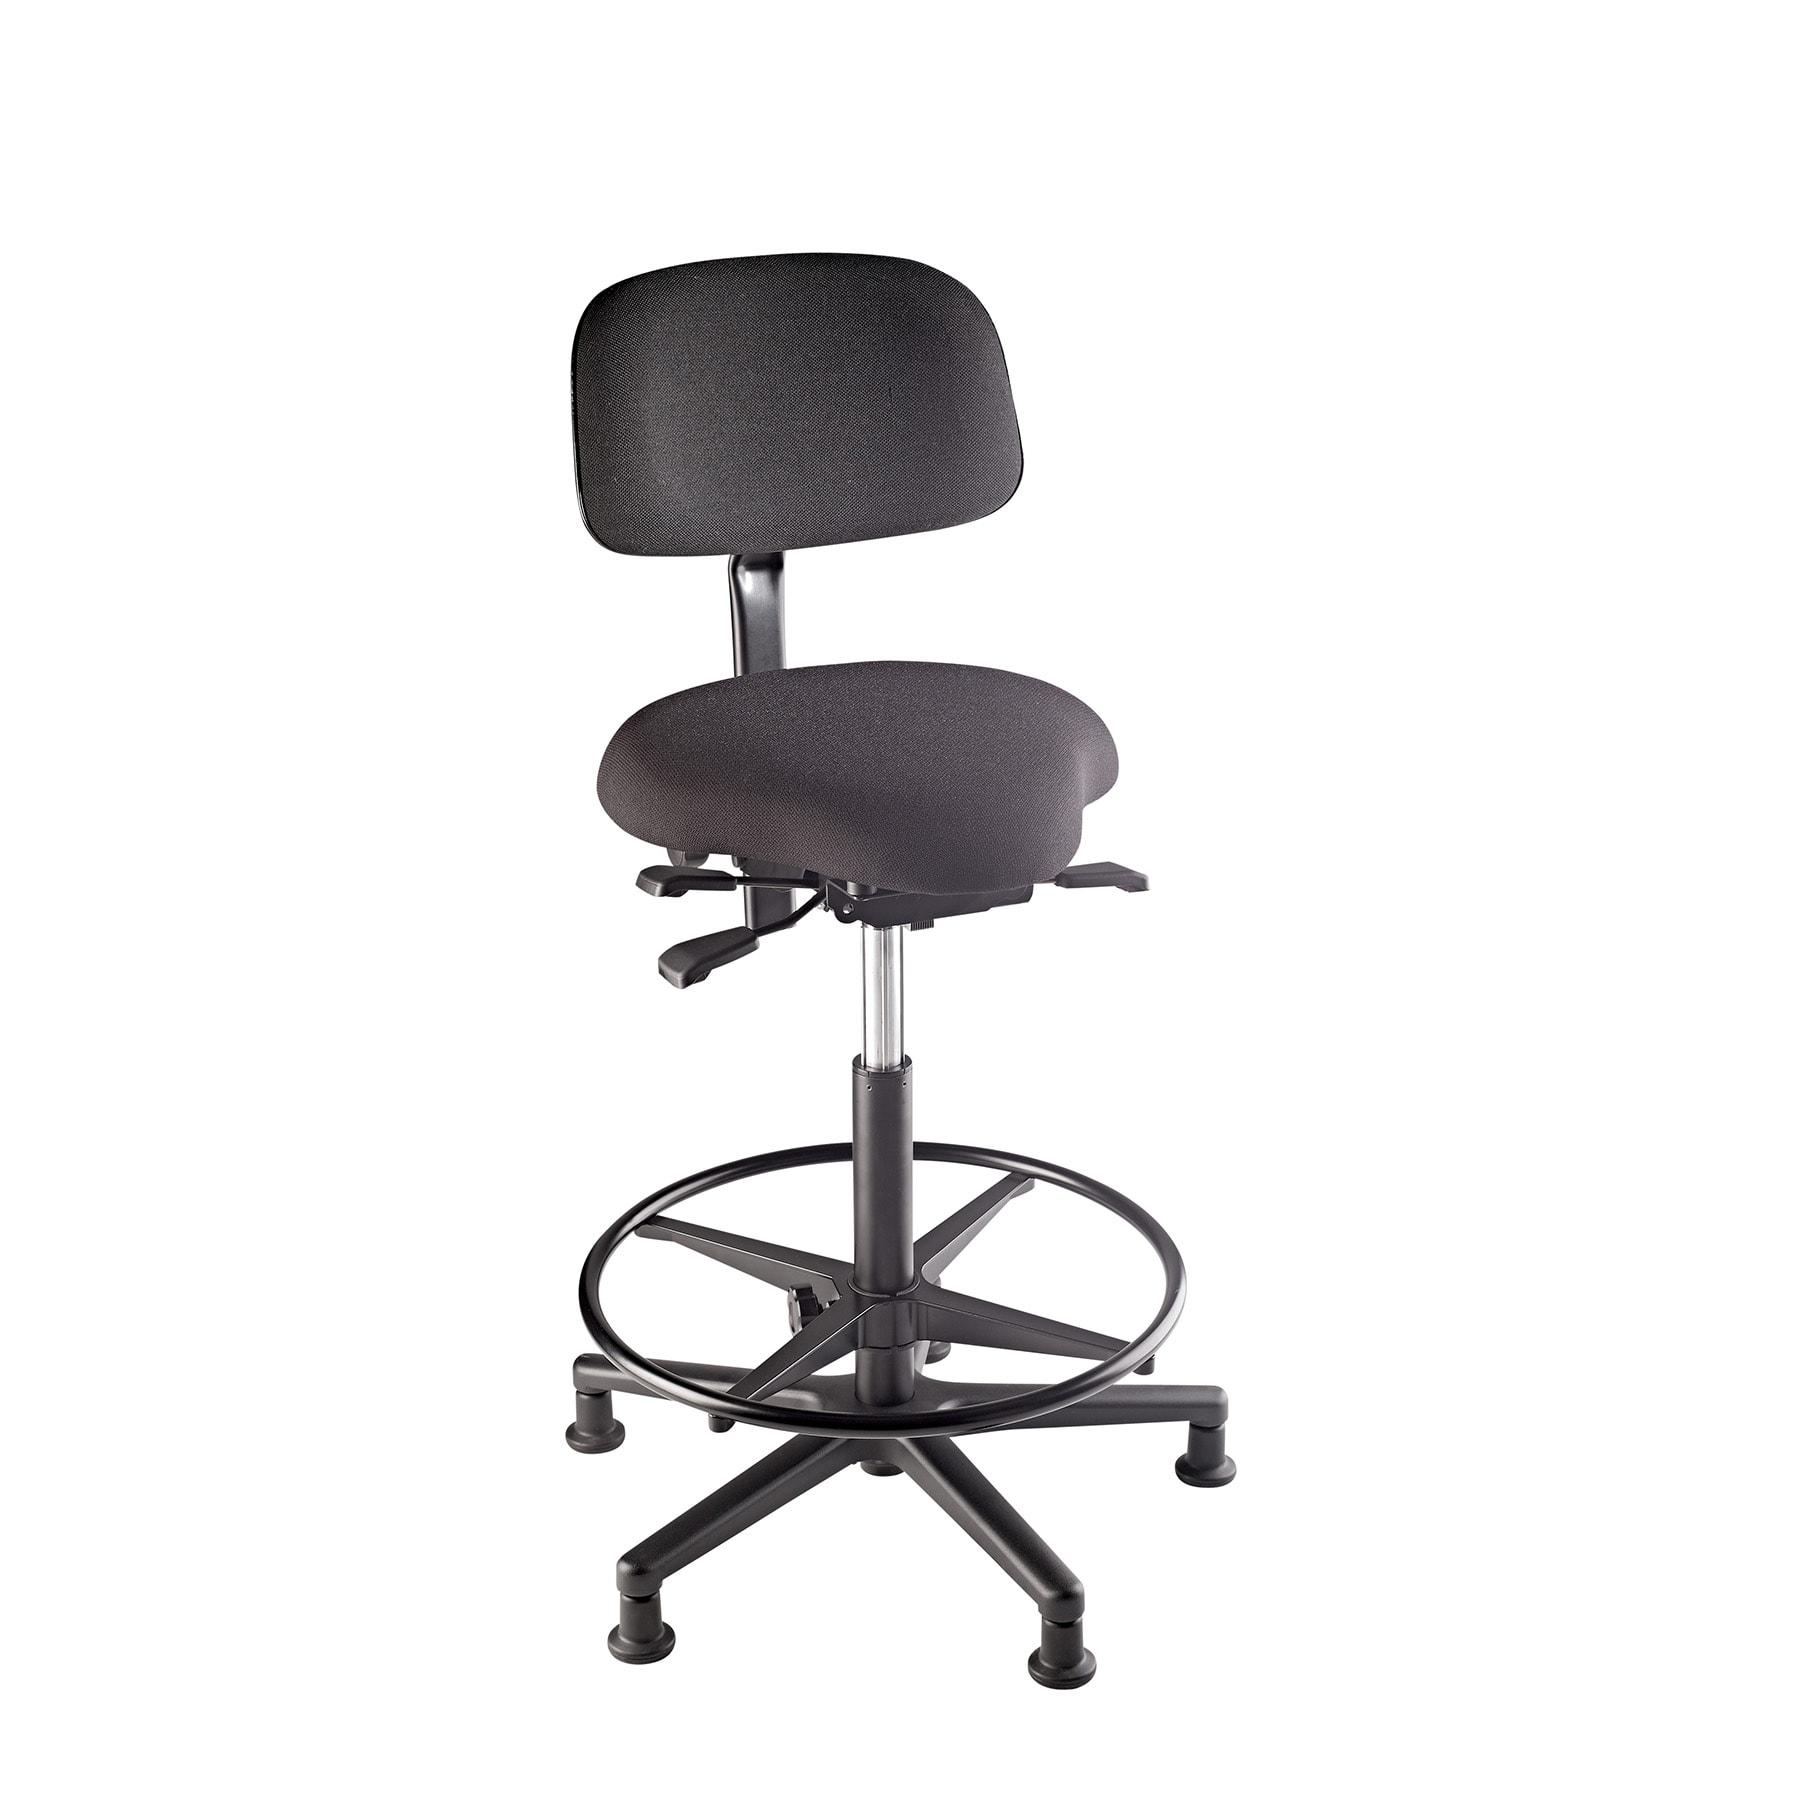 KM13460 - Bass stool